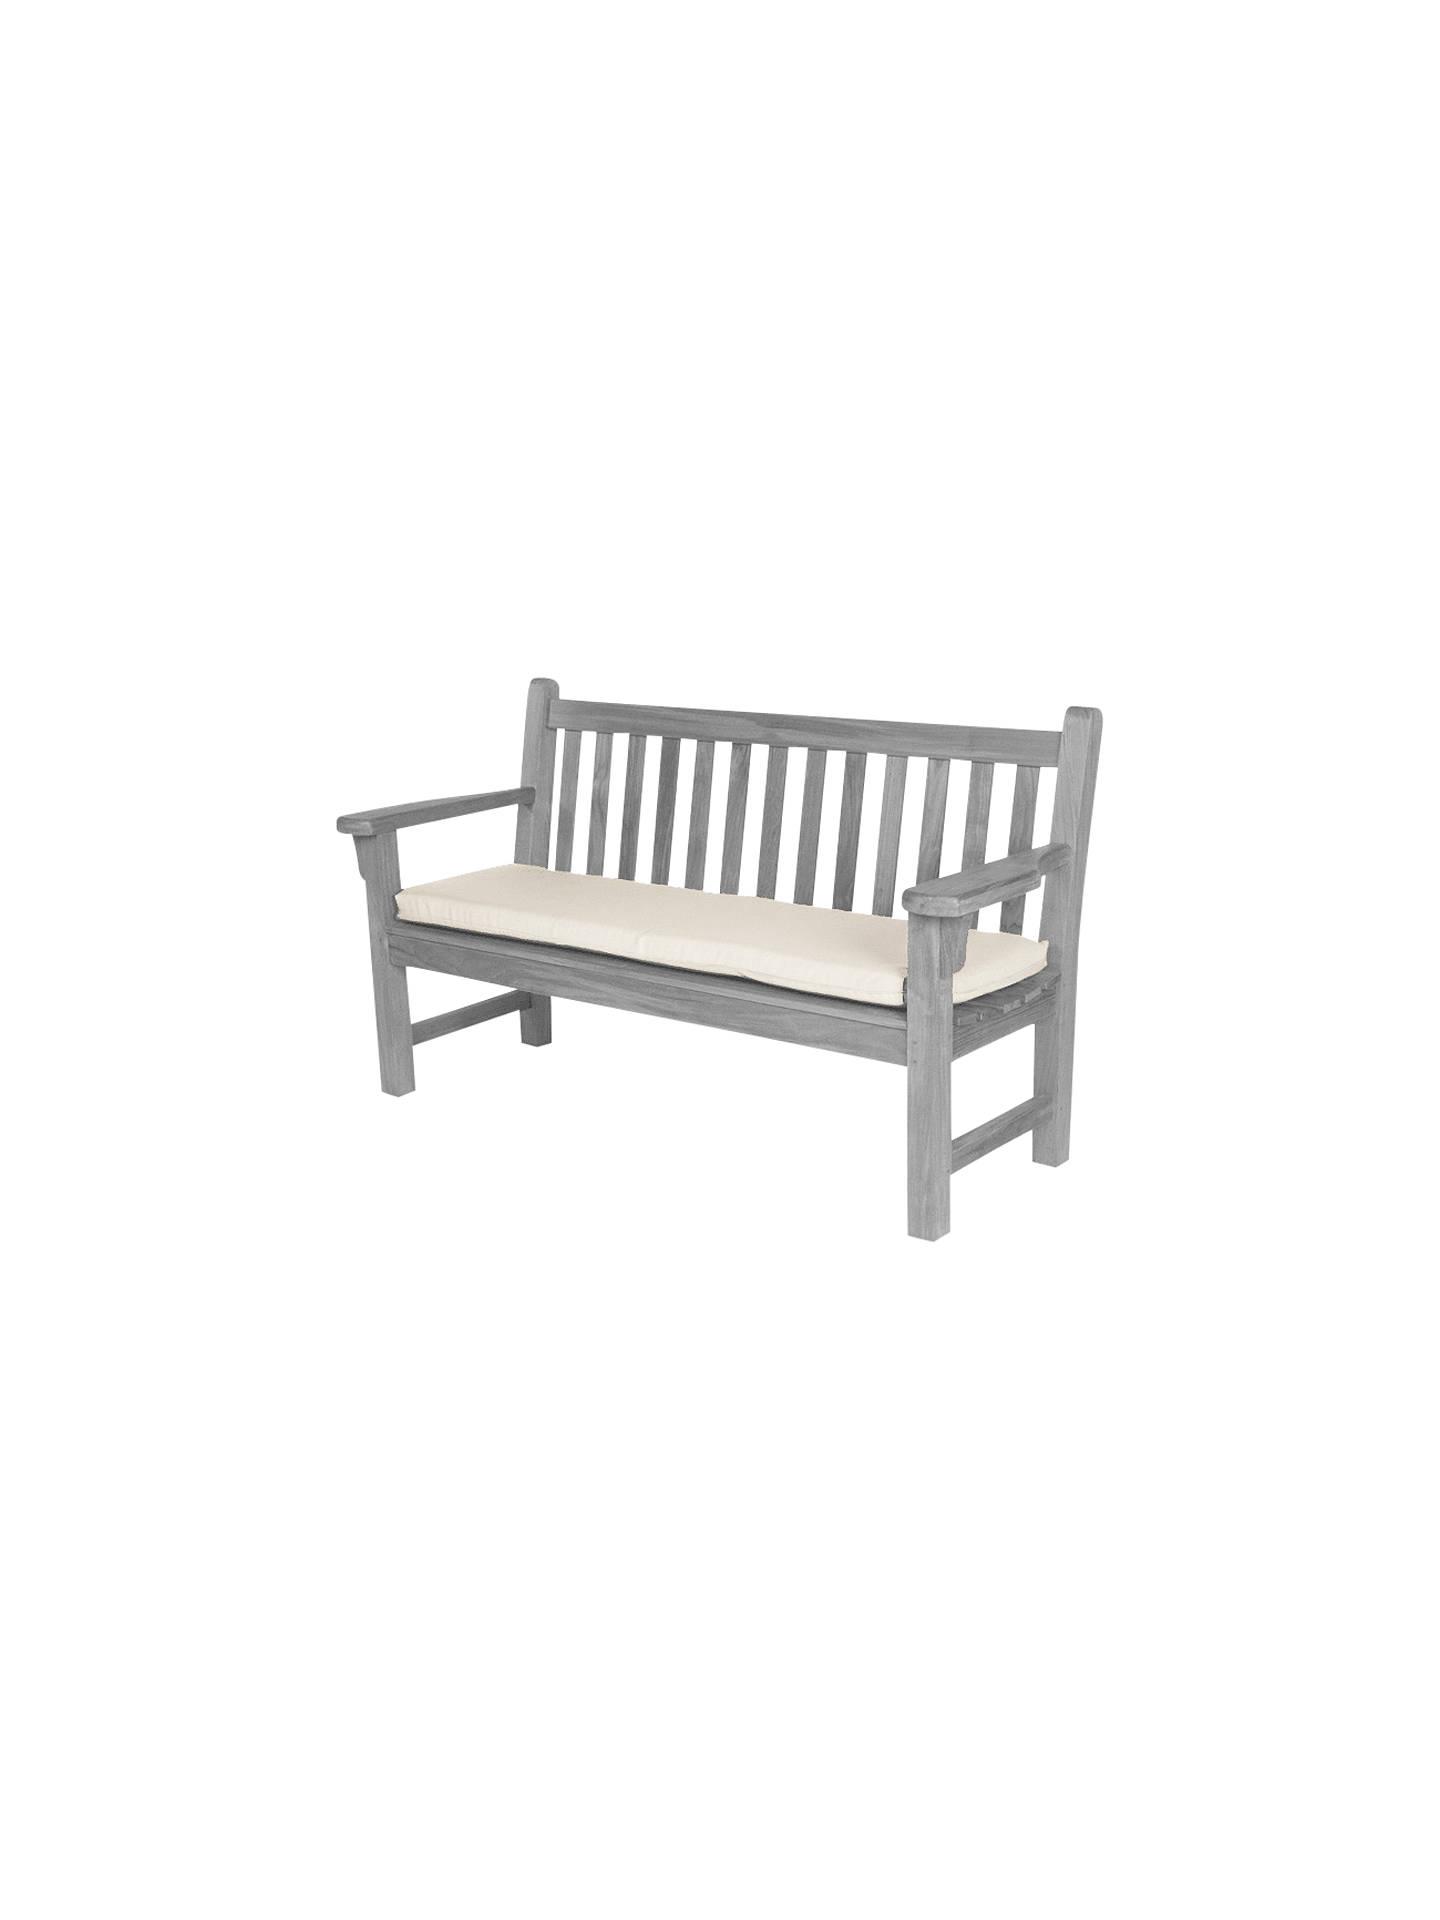 Barlow Tyrie 150cm Outdoor Bench